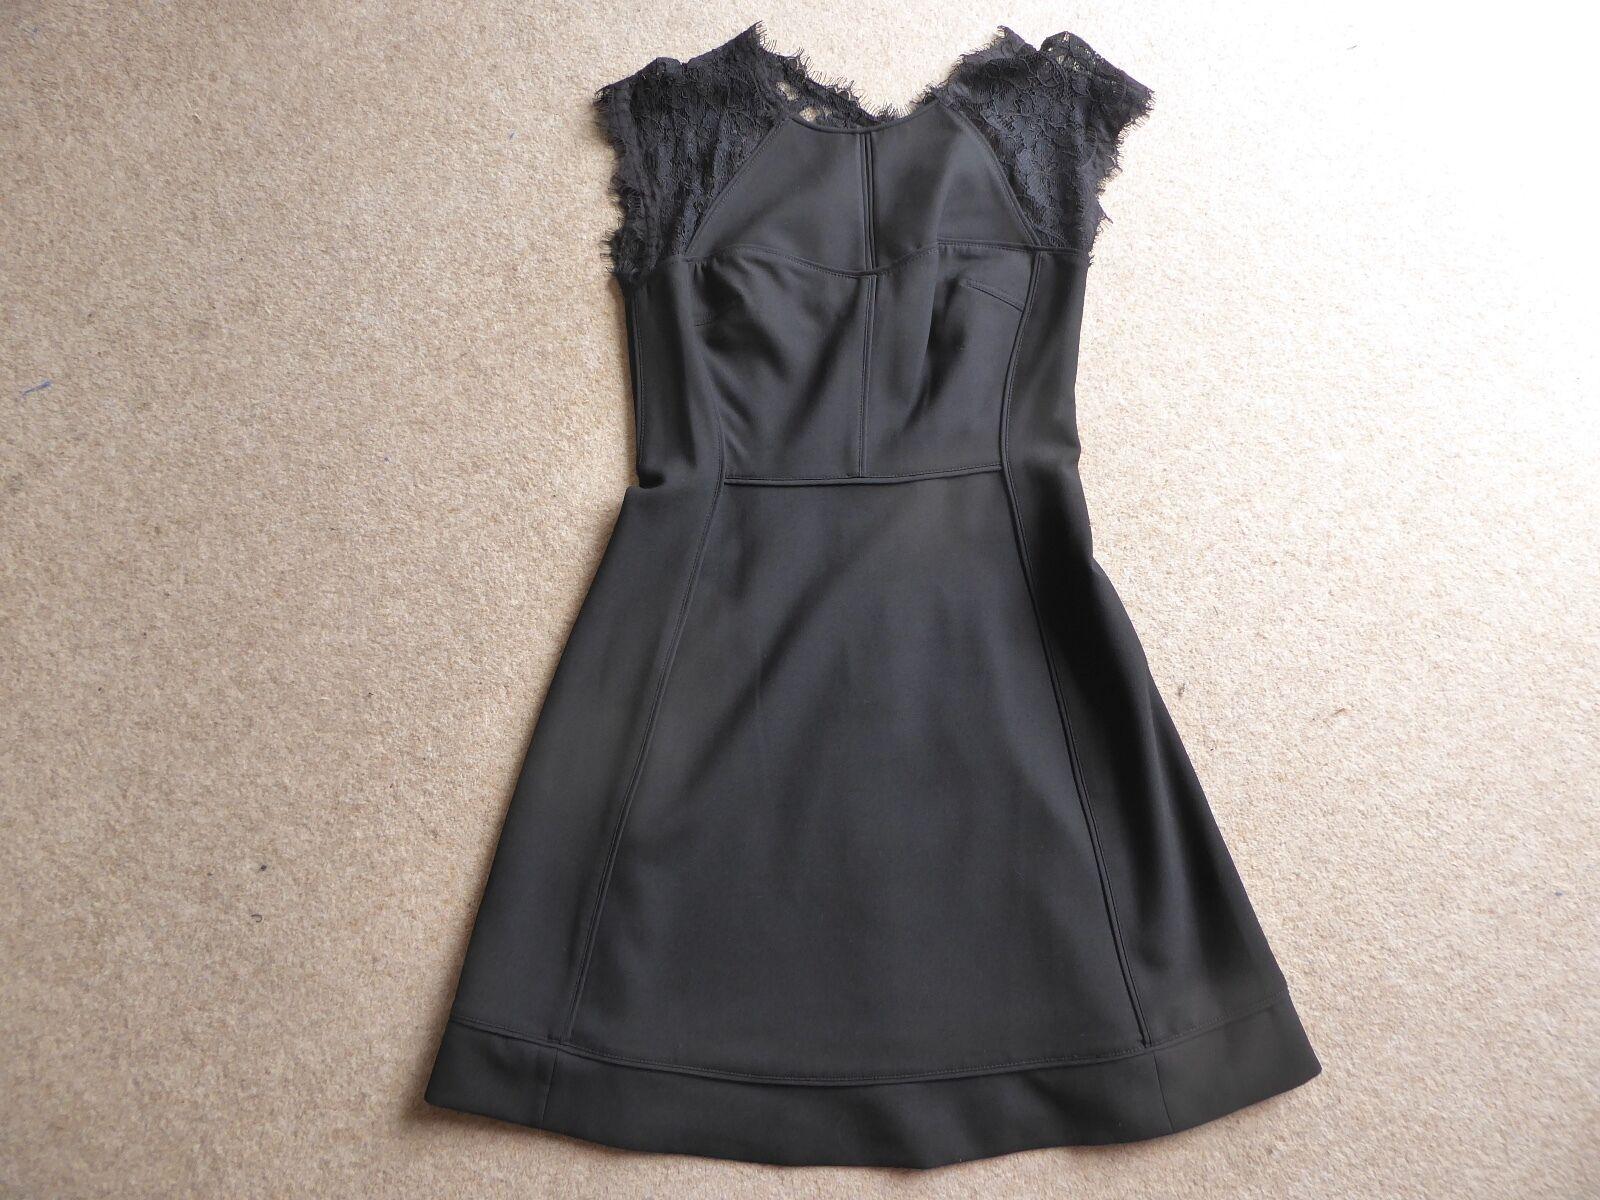 Diane Von Furstenberg DVF Maddie Dress Elena Elena Elena Vampire Diaries - Size US4 - NWT 862547